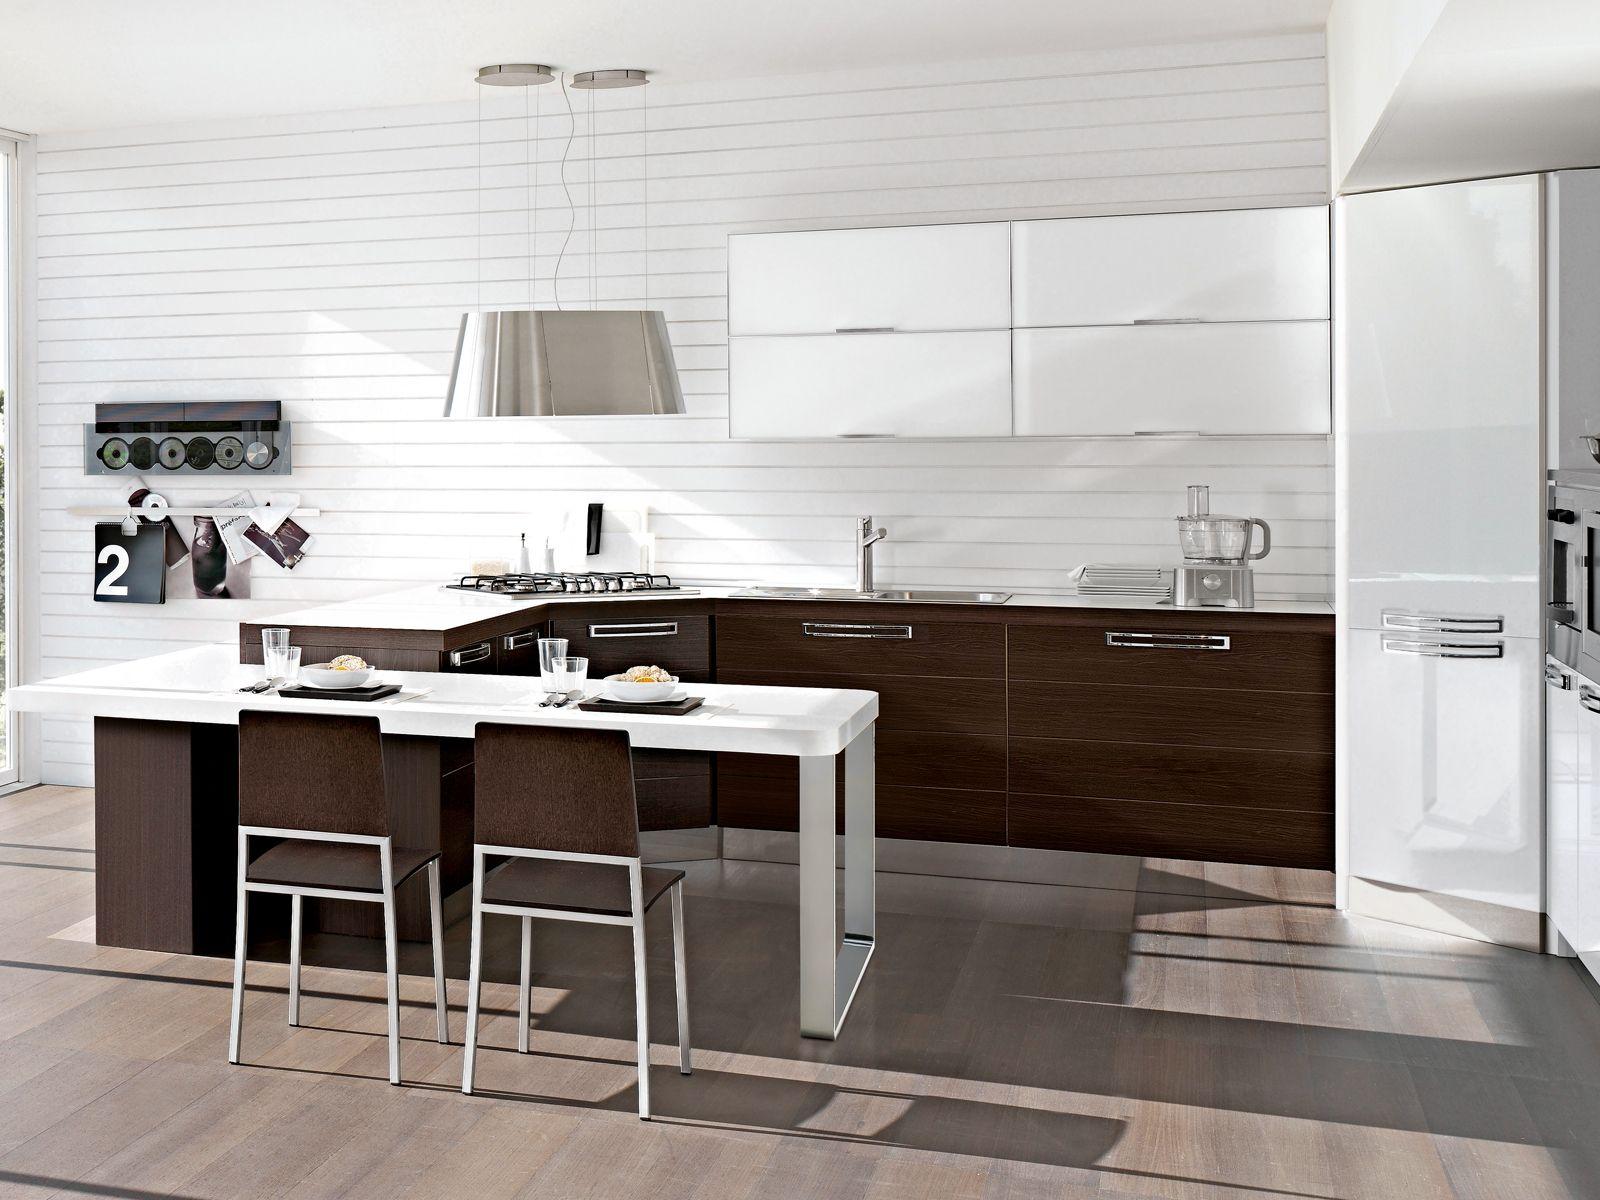 Piastrelle soggiorno e cucina gp86 regardsdefemmes - Piastrelle per cucina bianca ...